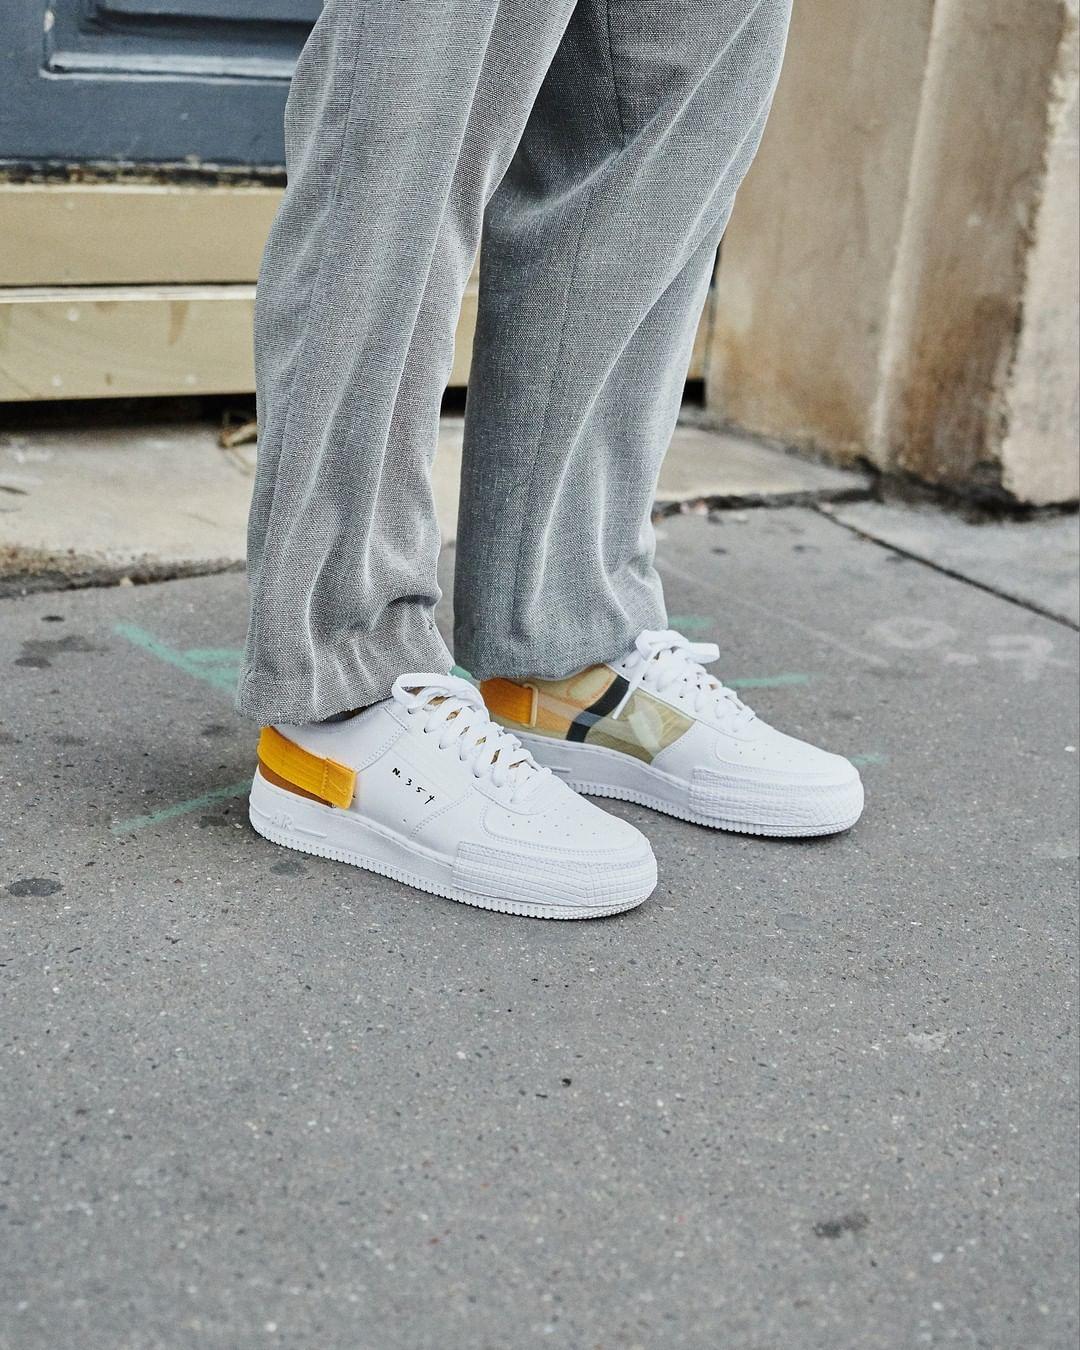 Air Force 1 Drop Type White Gold Yellow en 2020 Nike air